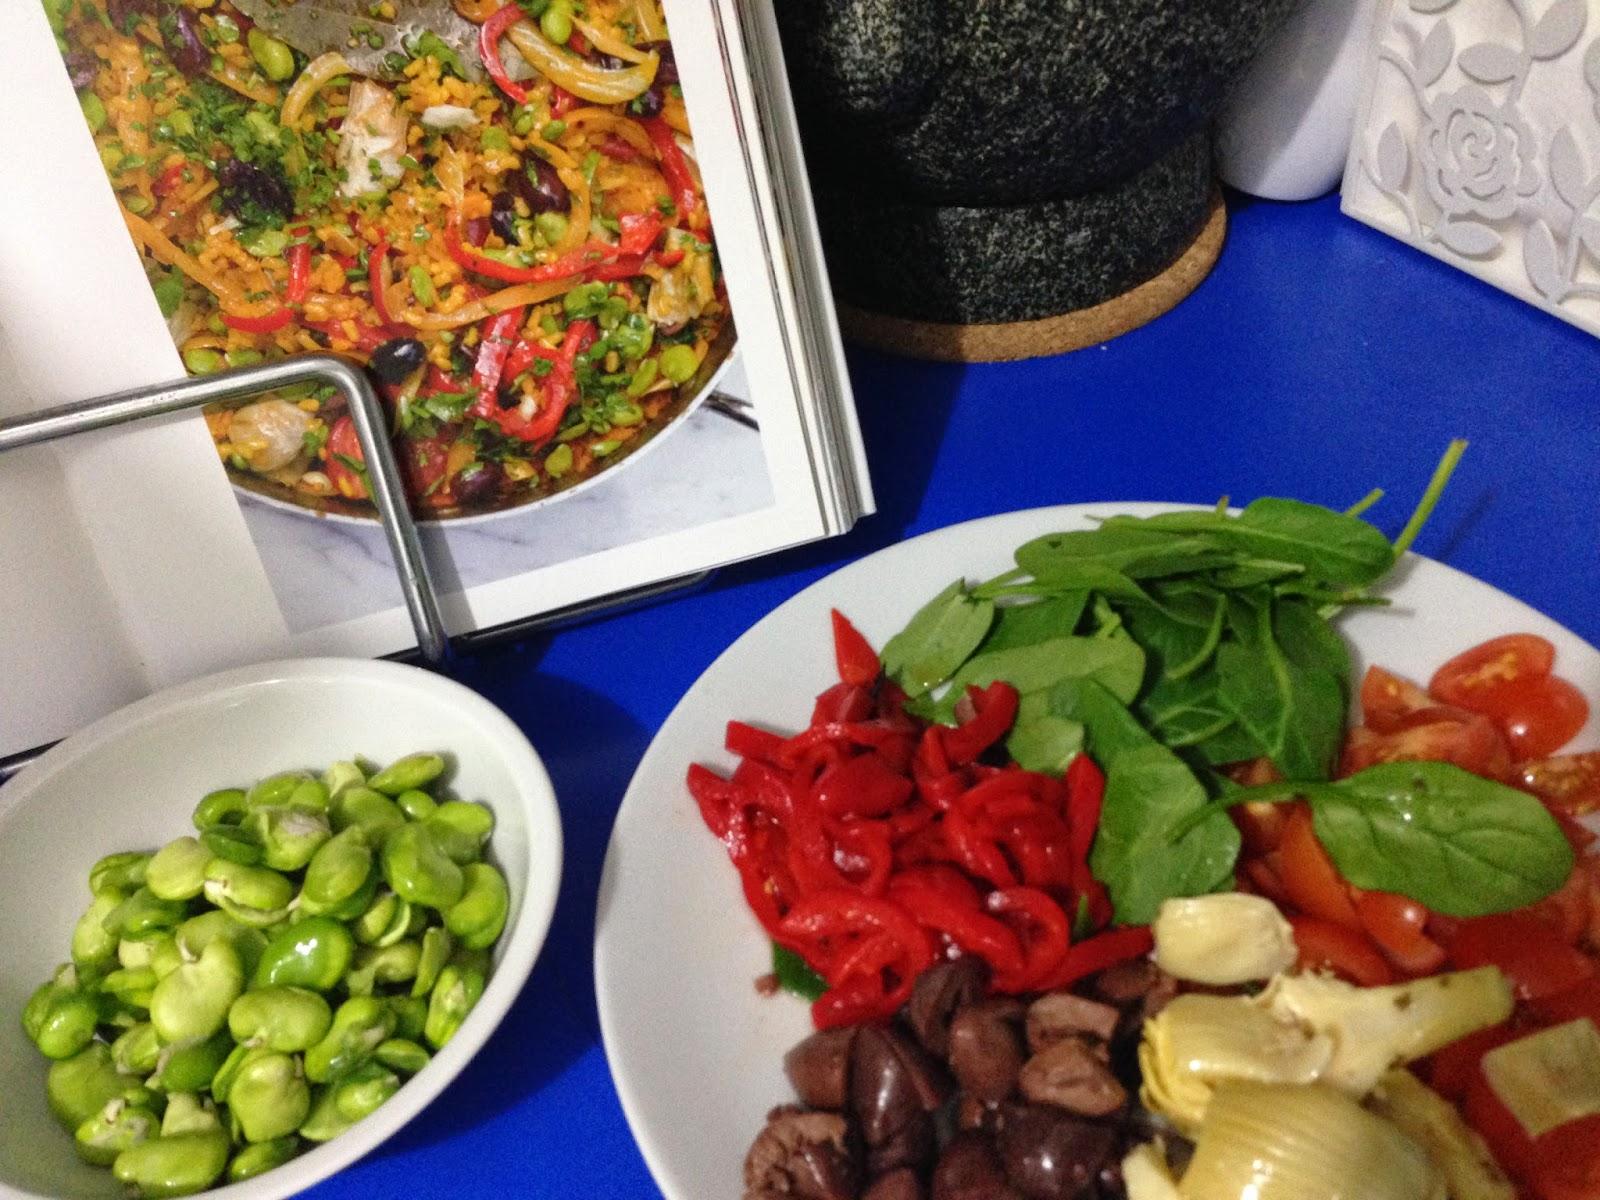 Yotam Ottolenghi 's Multi-vegetable Paella from Plenty